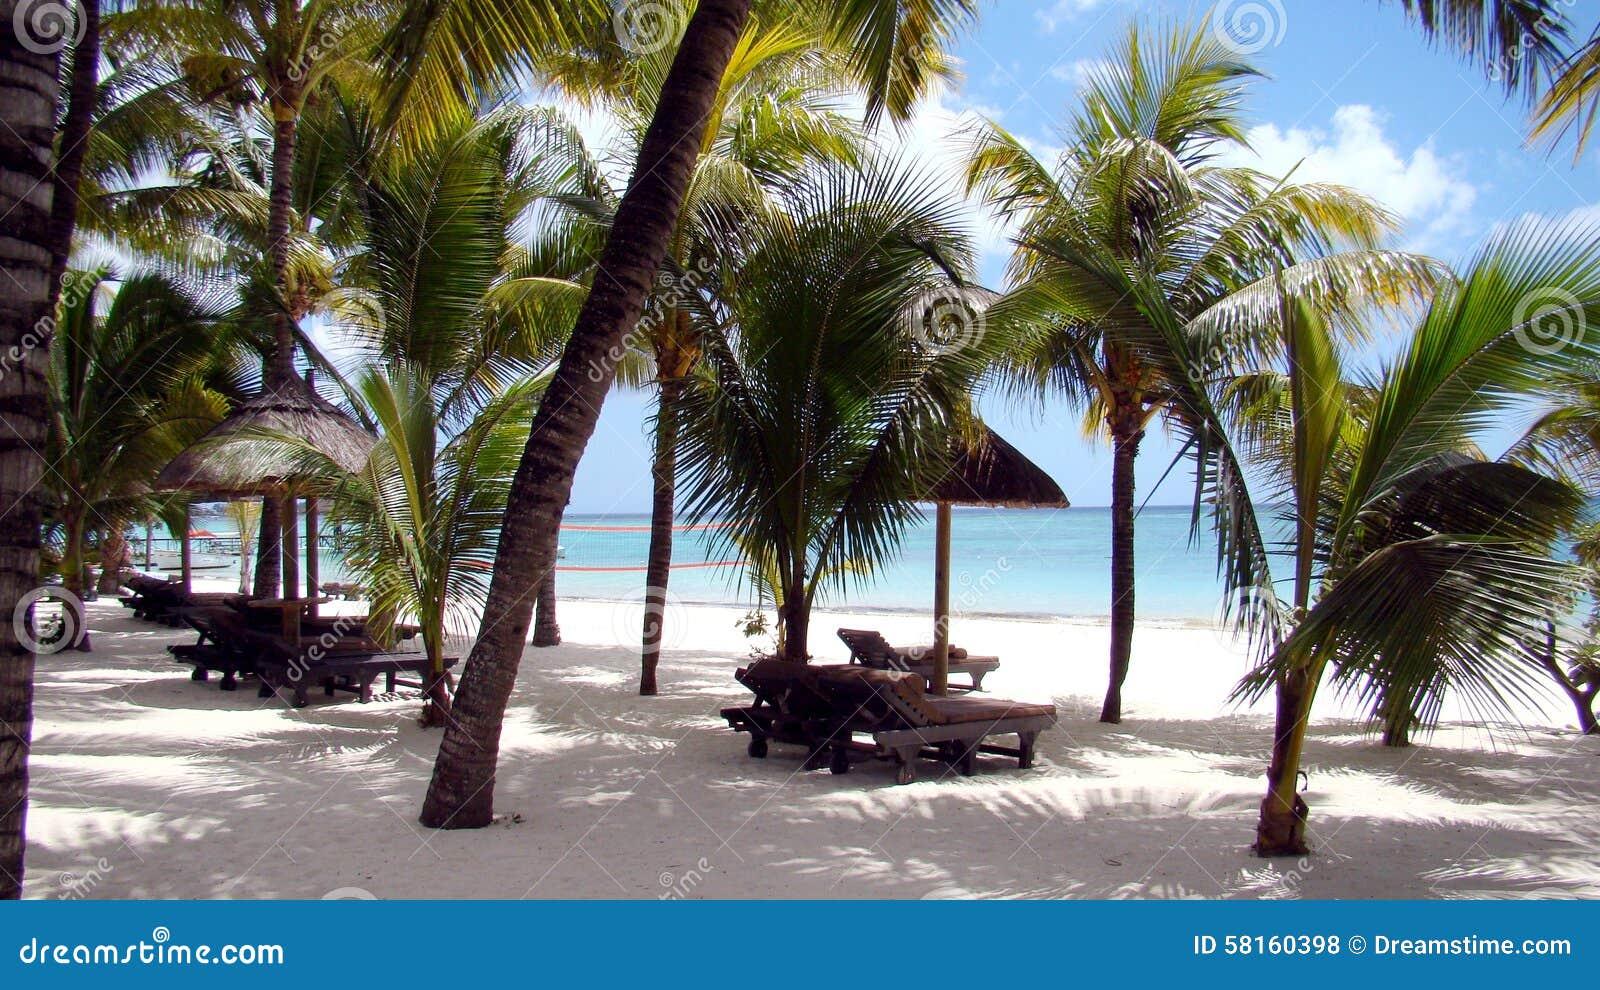 beach at punta cana stock photo image 58160398. Black Bedroom Furniture Sets. Home Design Ideas